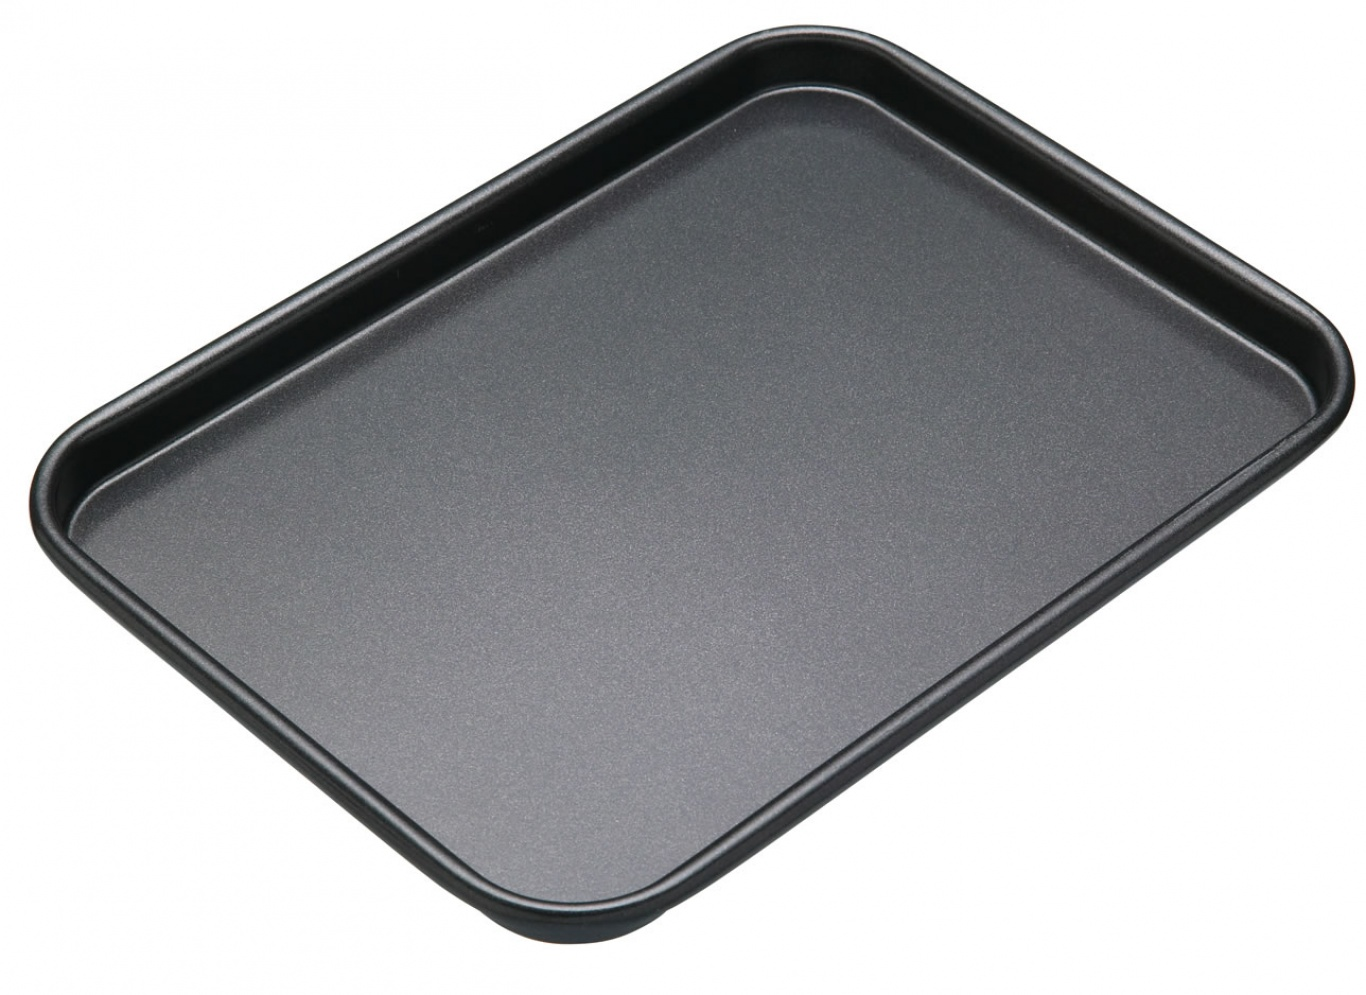 Image of Non Stick Baking Tray 16.5cm x 10cm x 2cm